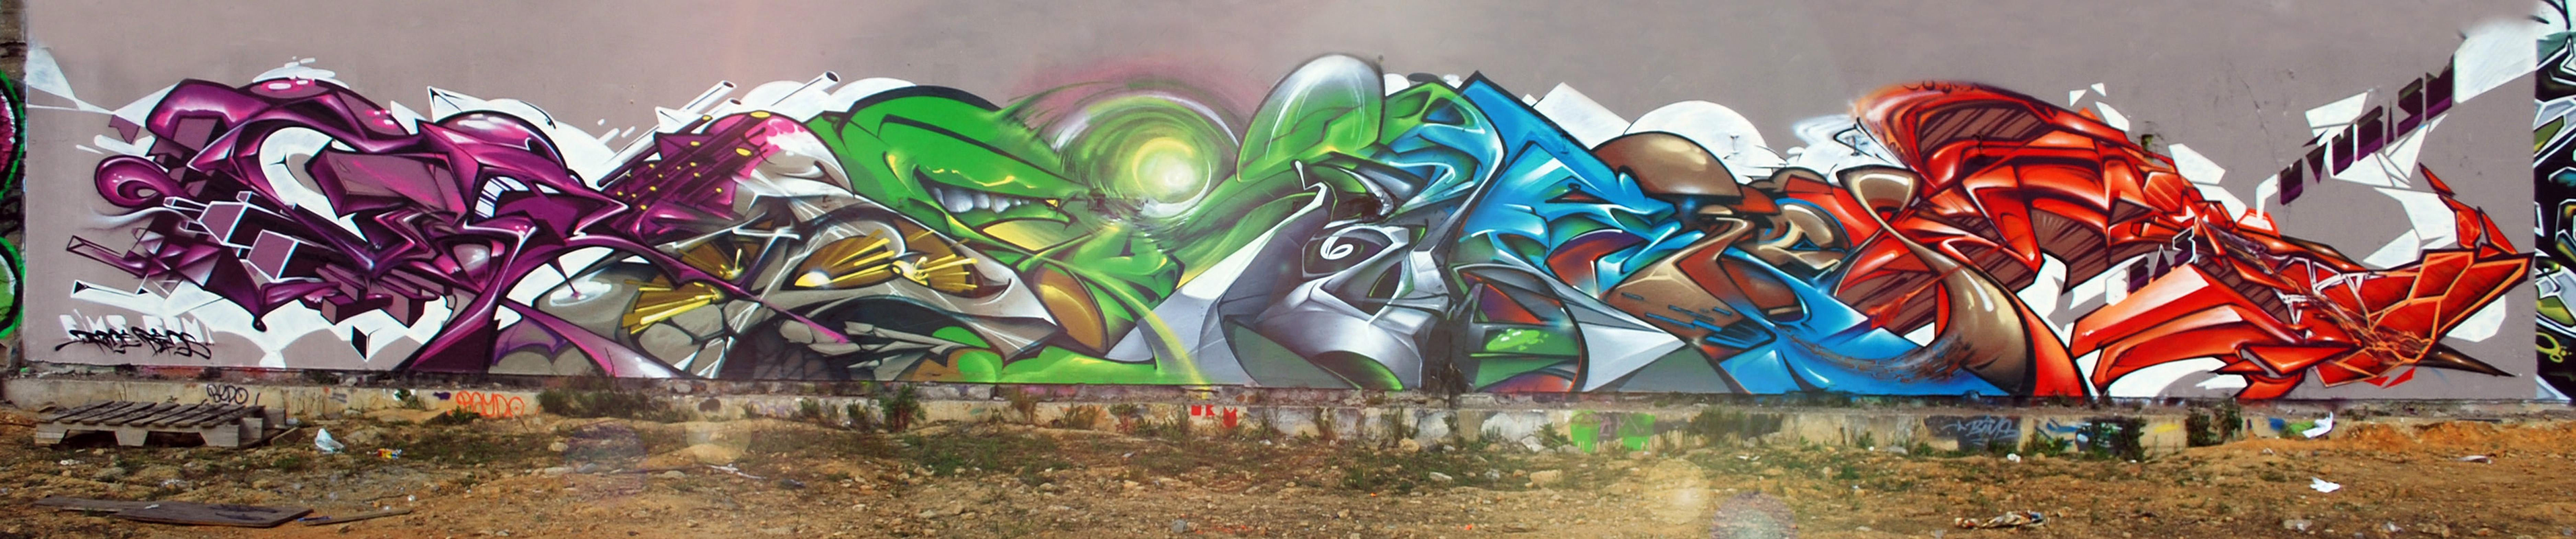 Wallpaper 3D Triangle Graffiti Street Art Ghetto